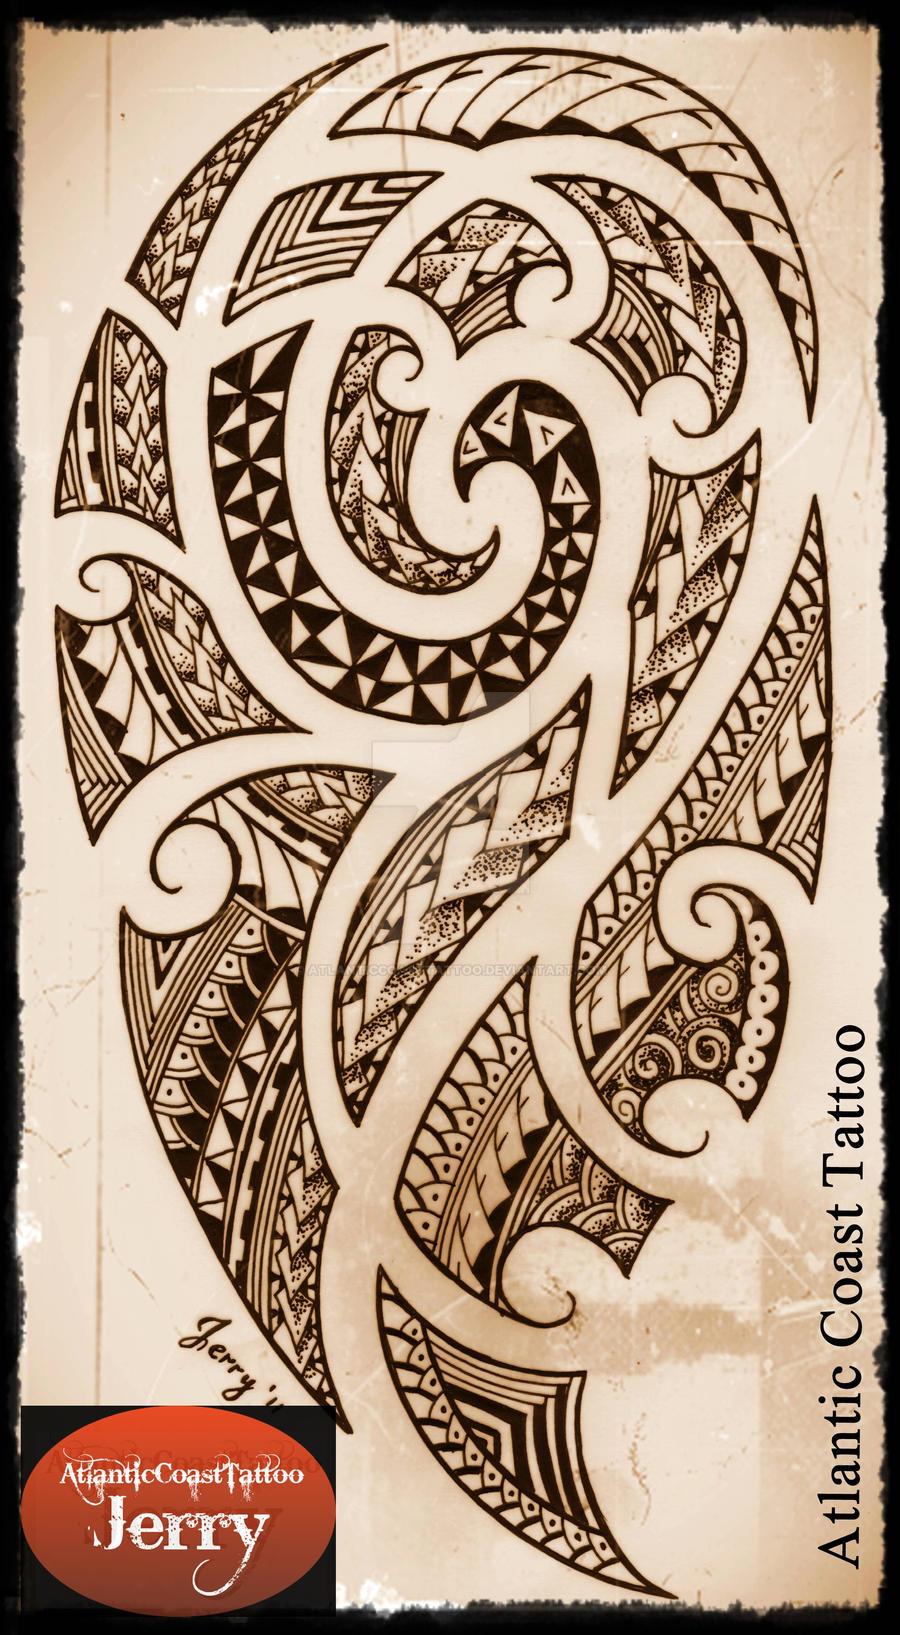 Polynesian Maori Samoan Tattoo Design Drawing By Atlanticcoasttattoo On Deviantart Tattoo sketch, handmade design over vintage paper. polynesian maori samoan tattoo design